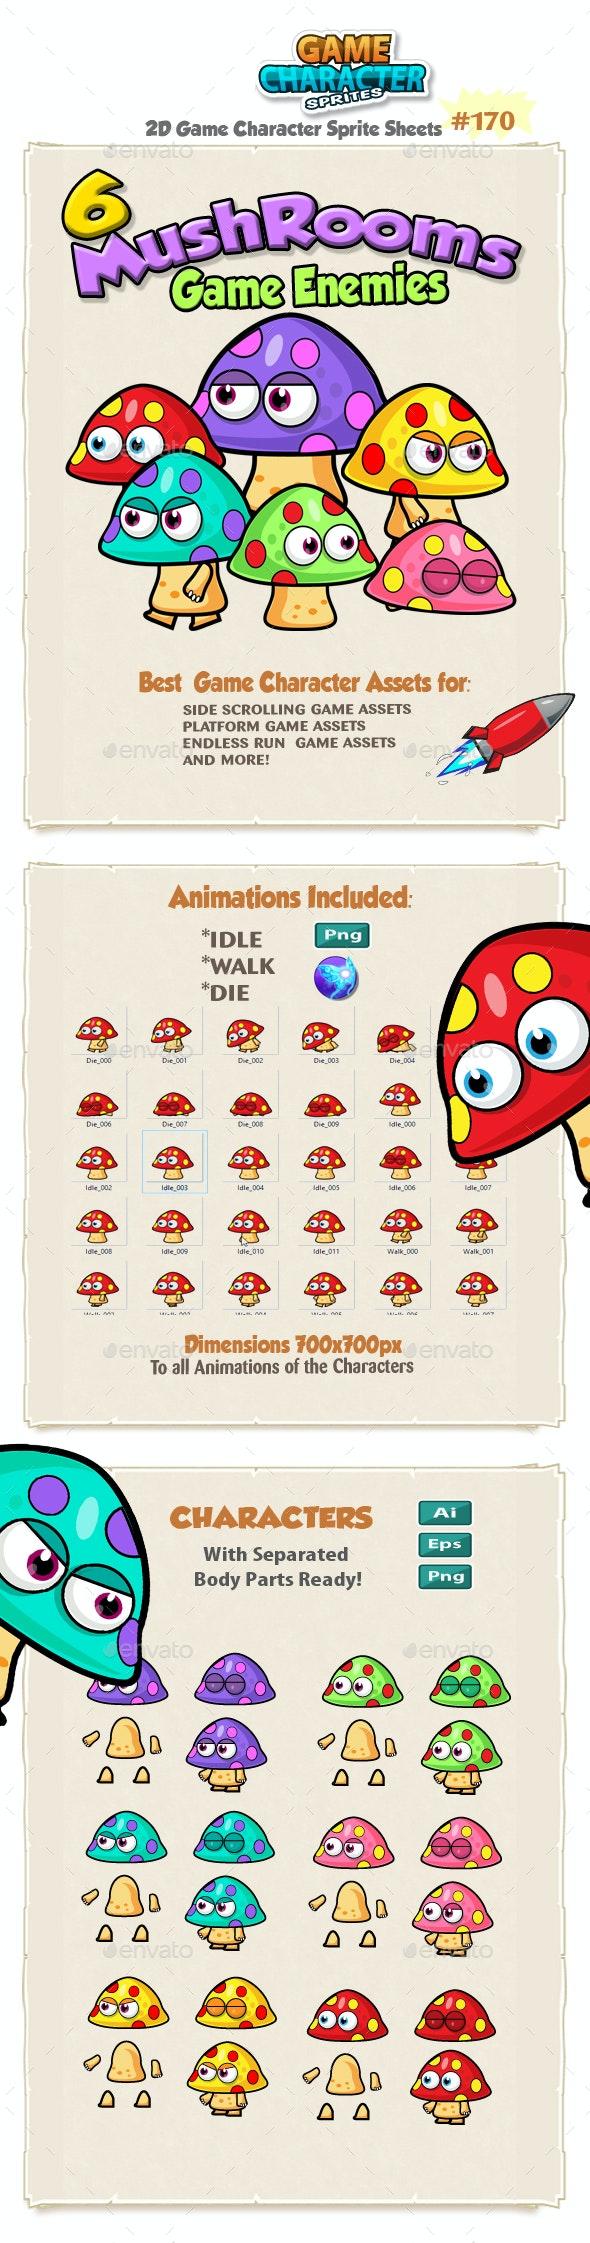 Mushrooms Game Enemies  character Sprites 171 - Sprites Game Assets